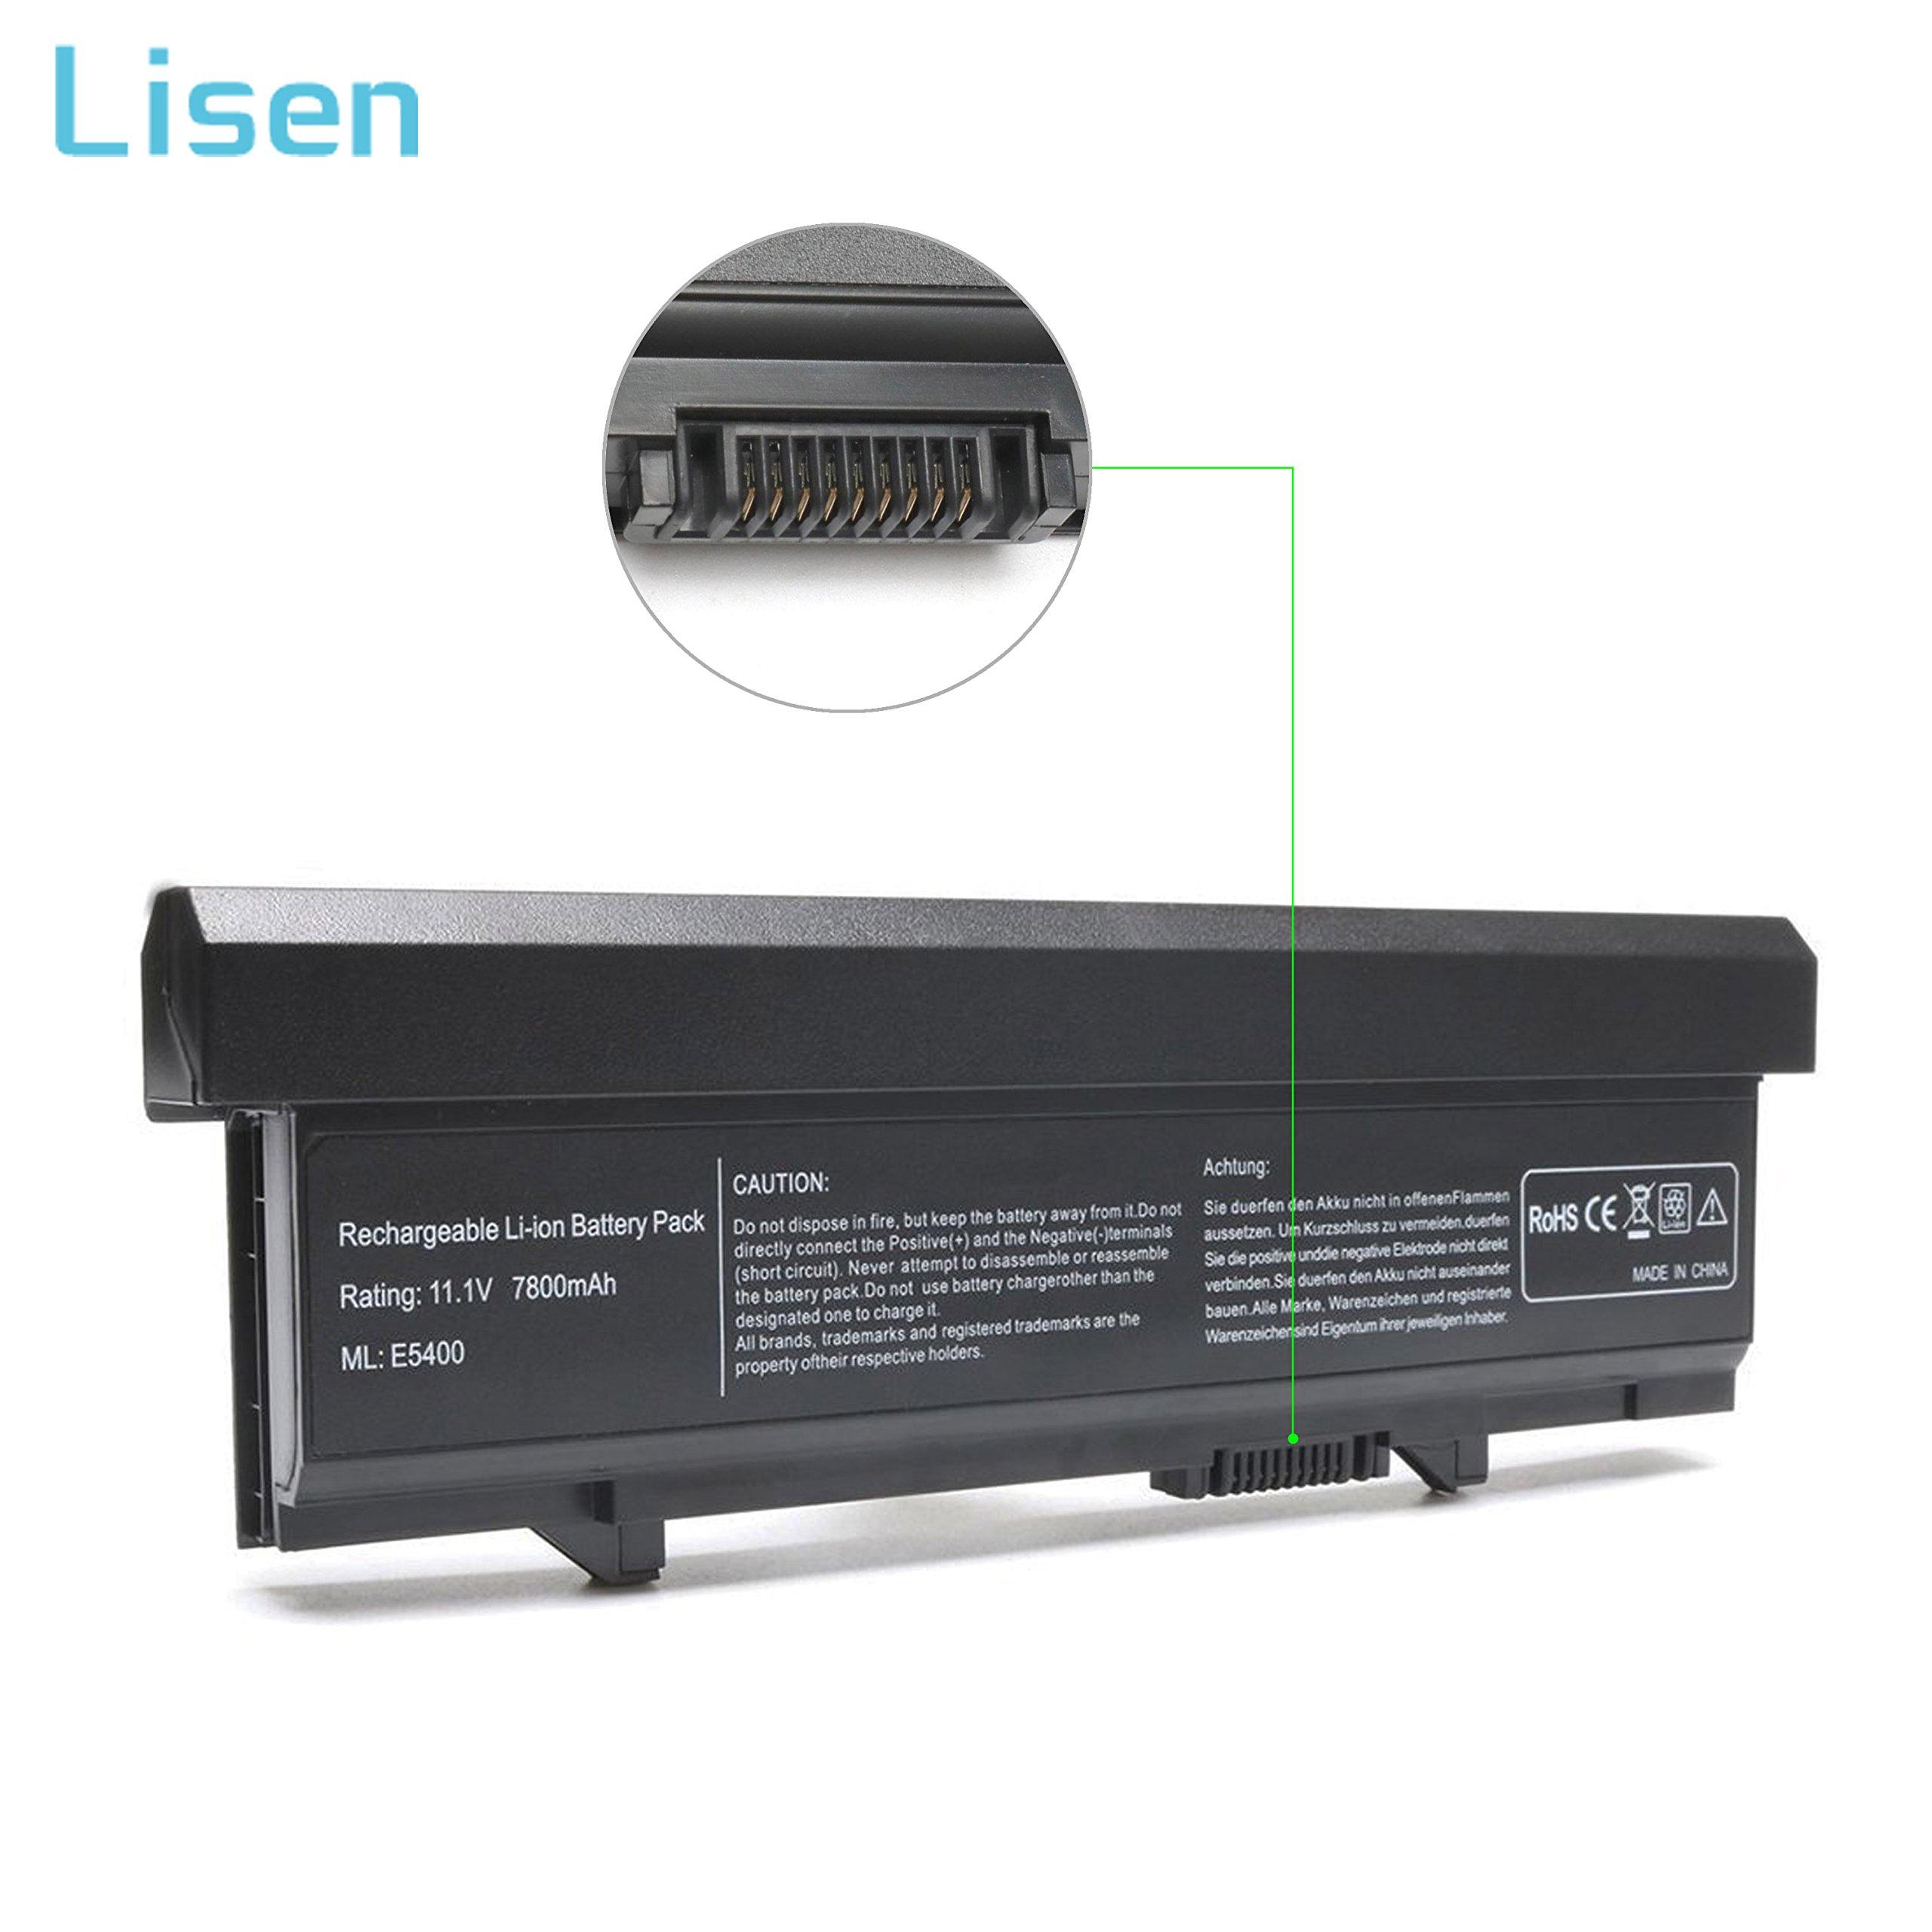 Lisen Laptop Battery for Dell Latitude E5400 E5410 E5500 E5510, P/N: KM742 WU841 KM668 KM769 KM771 PW640 U116D W071D RM649 RM656 0RM668 312-0762 312-0769 312-0902 451-10616 451-10617 [11.1V 7800mAh]